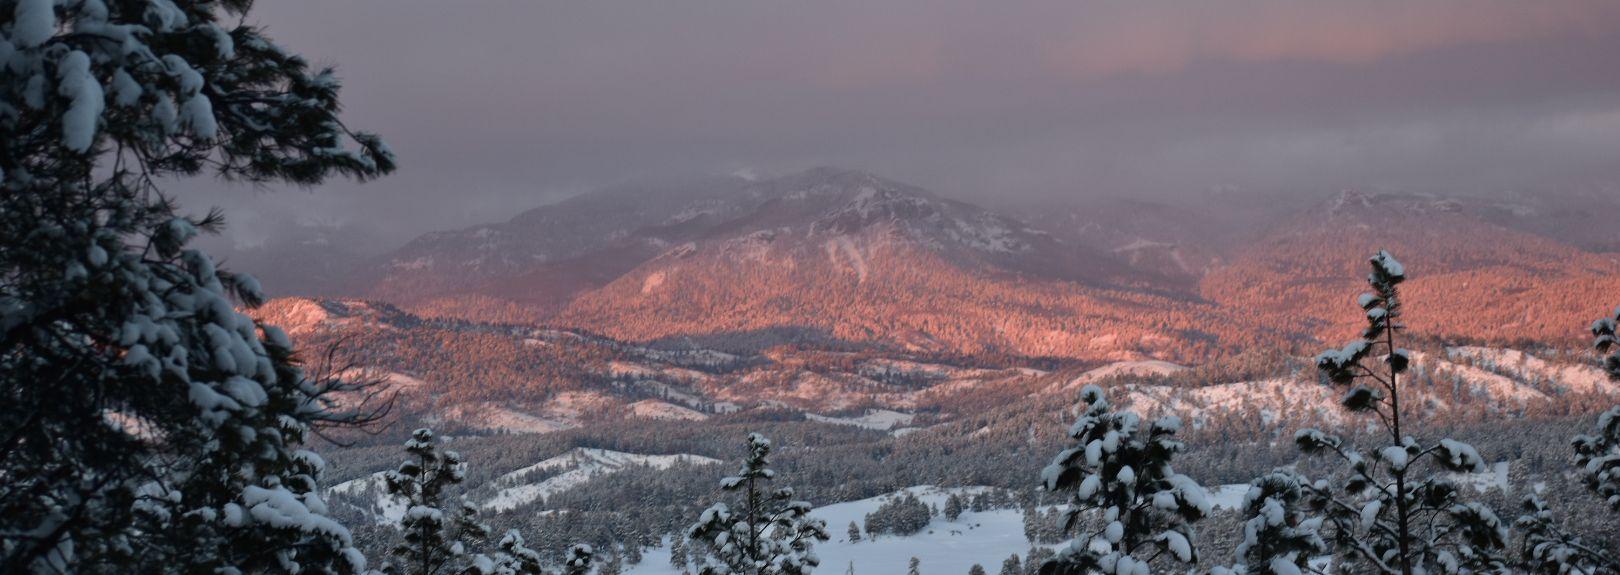 Wolf Creek Ski Area, Pagosa Springs, Colorado, United States of America